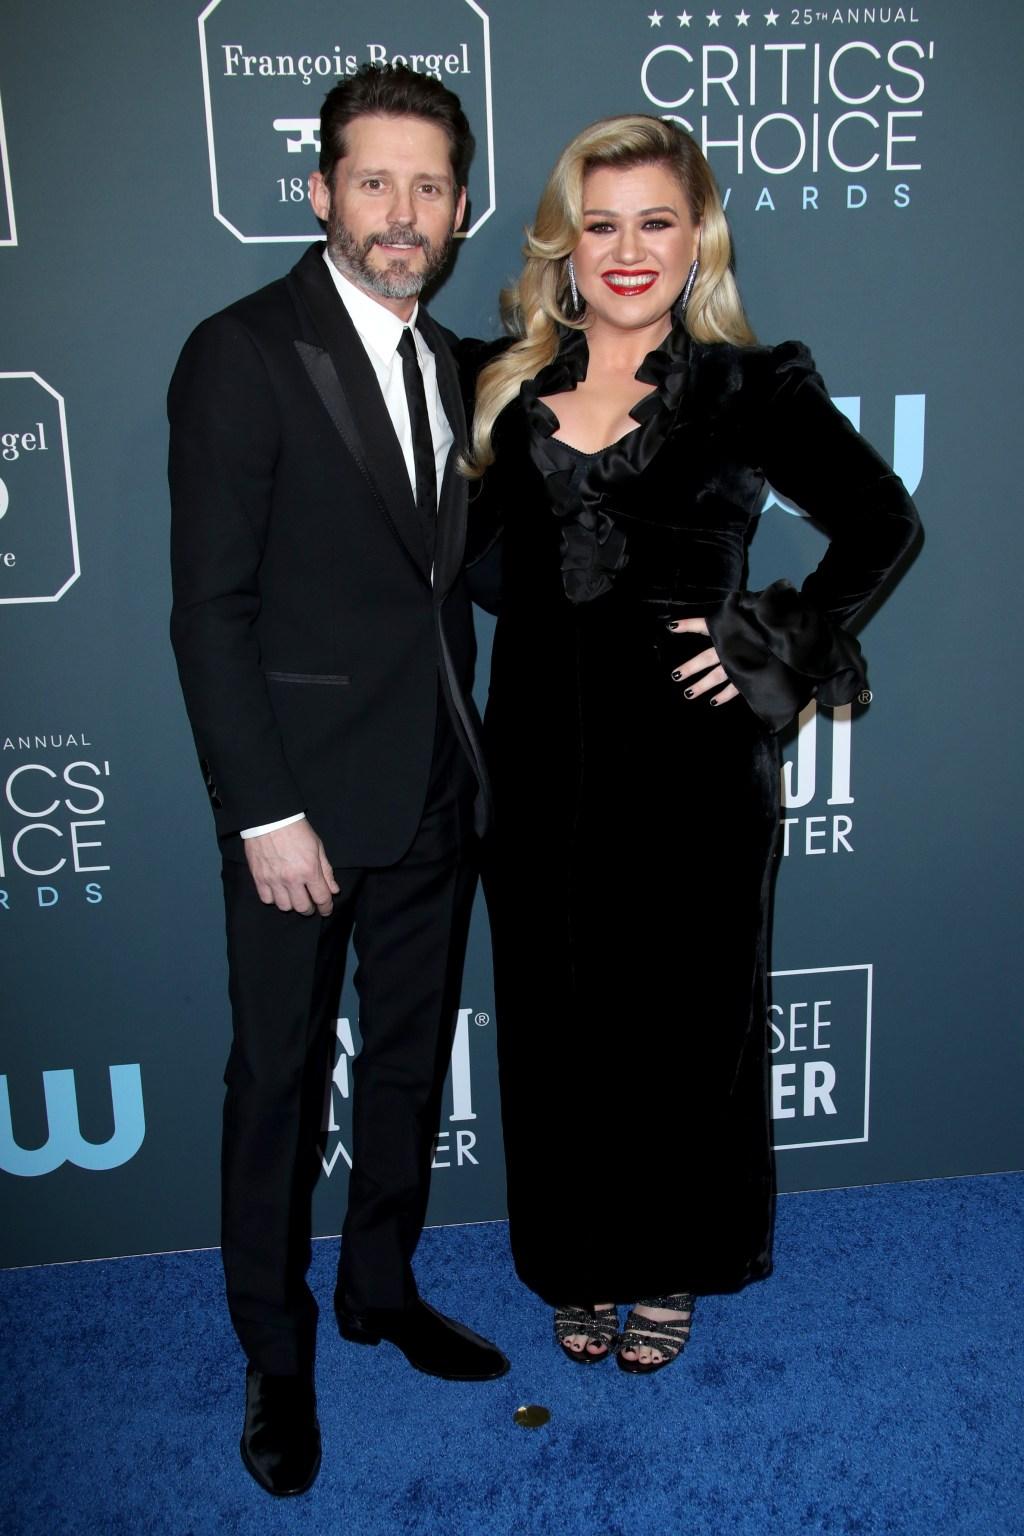 Kelly Clarkson, ex husband Brandon Blackstock, Critics Choice Awards